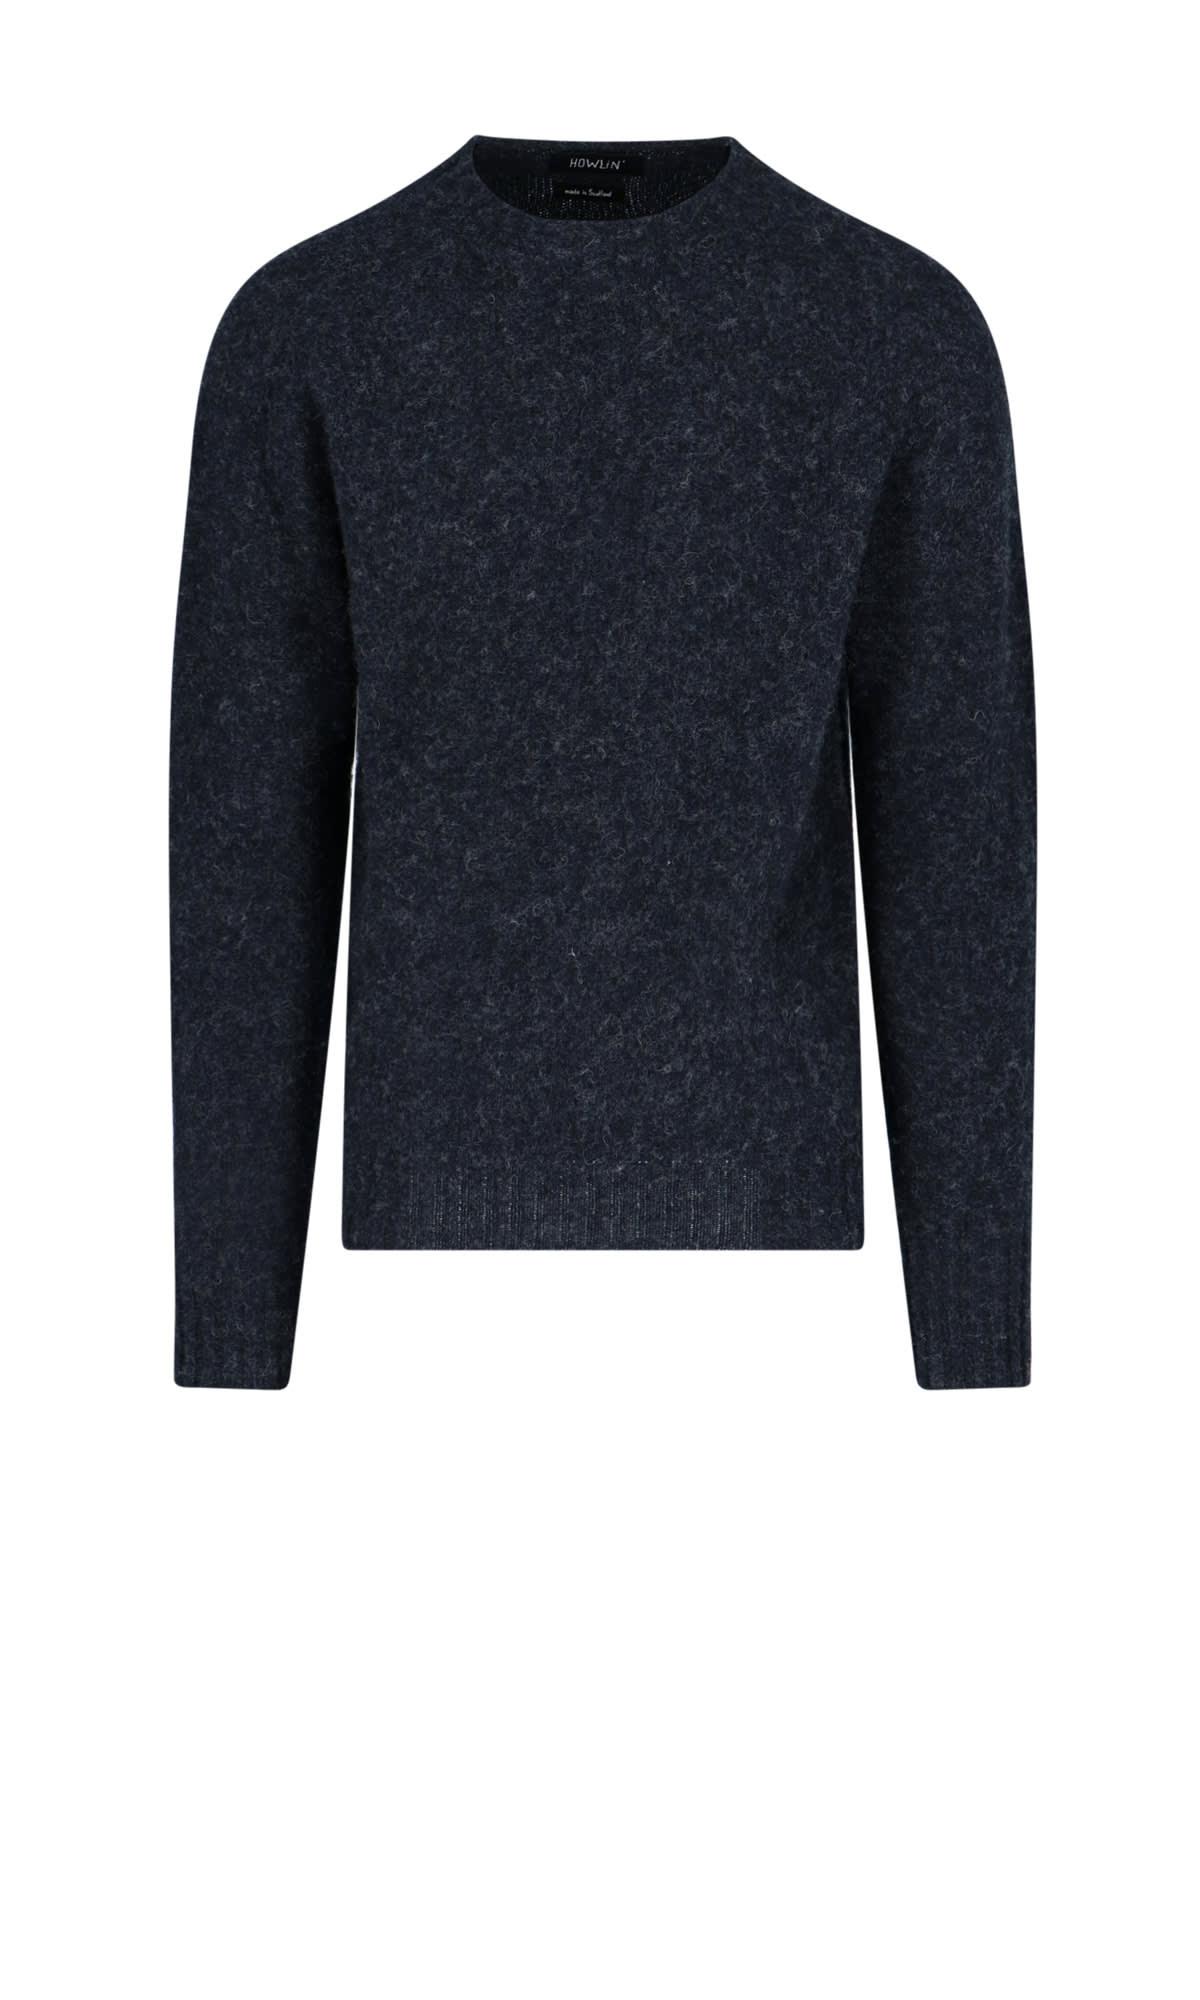 Howlin' Sweater In Grey